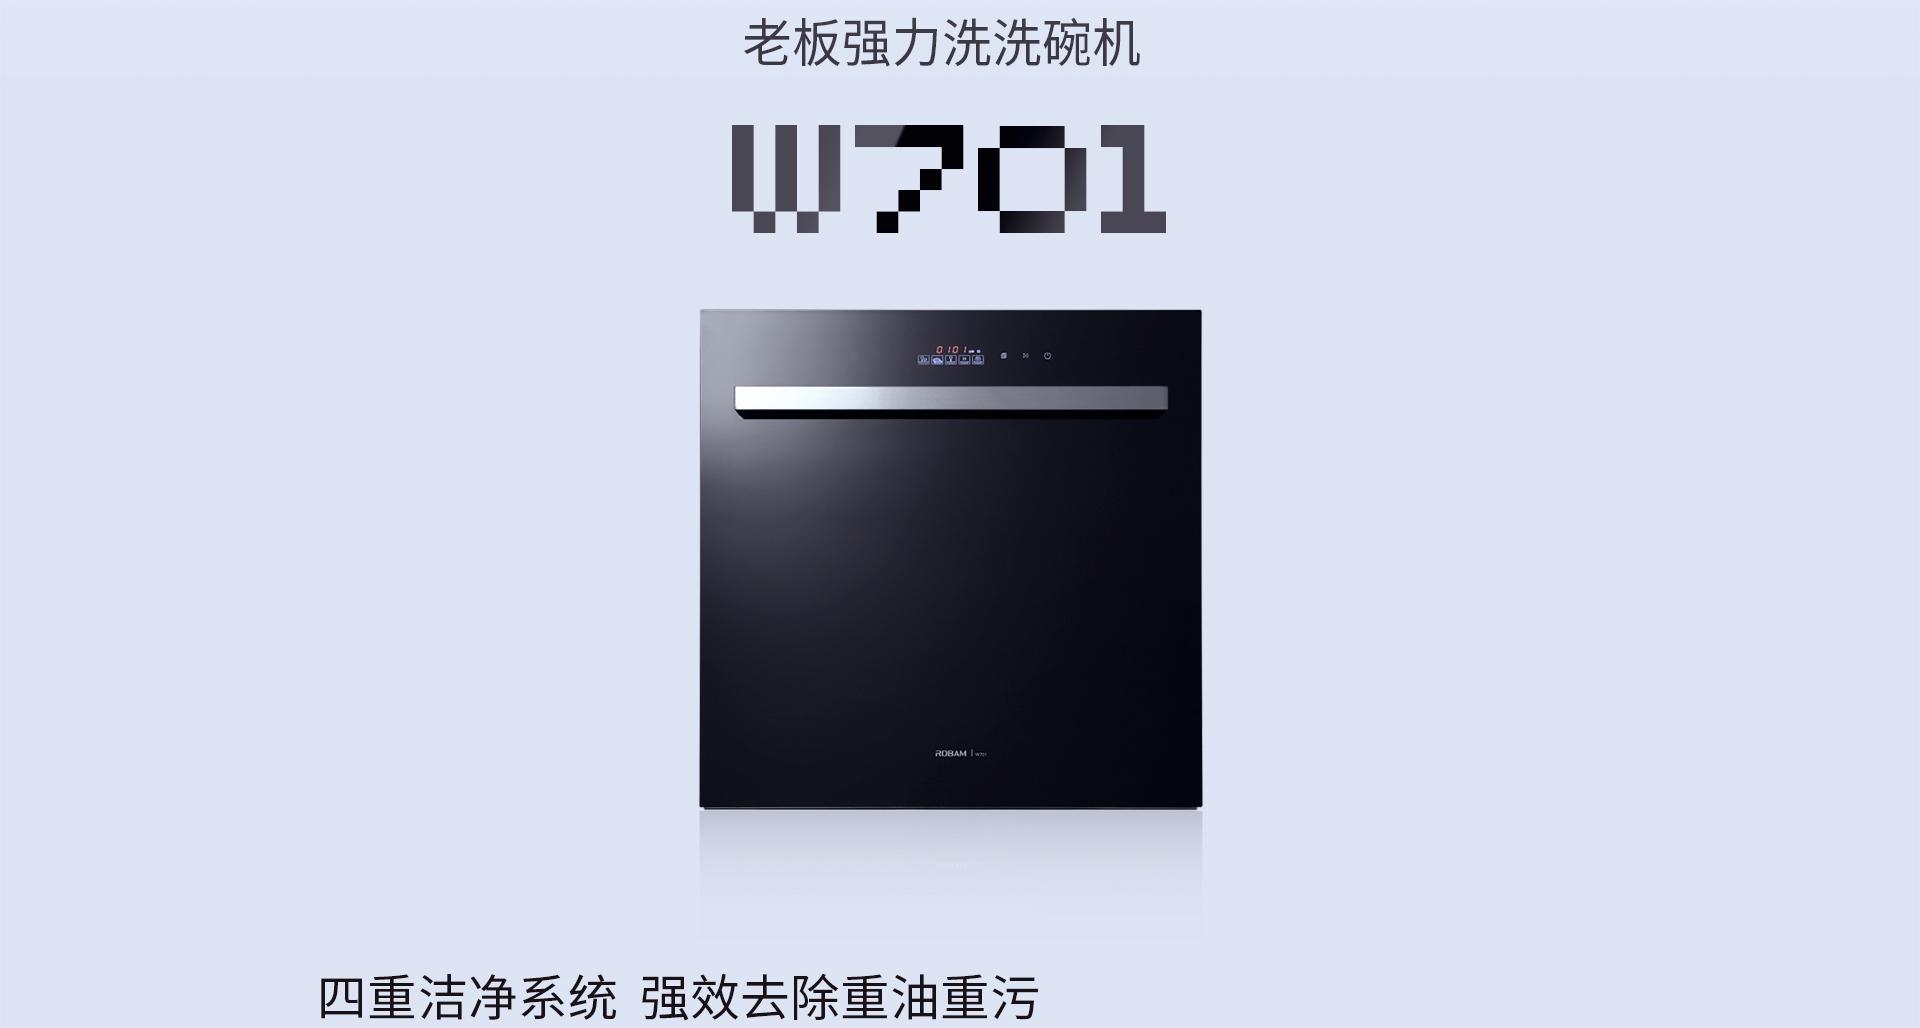 W701网页版-180719_02.jpg